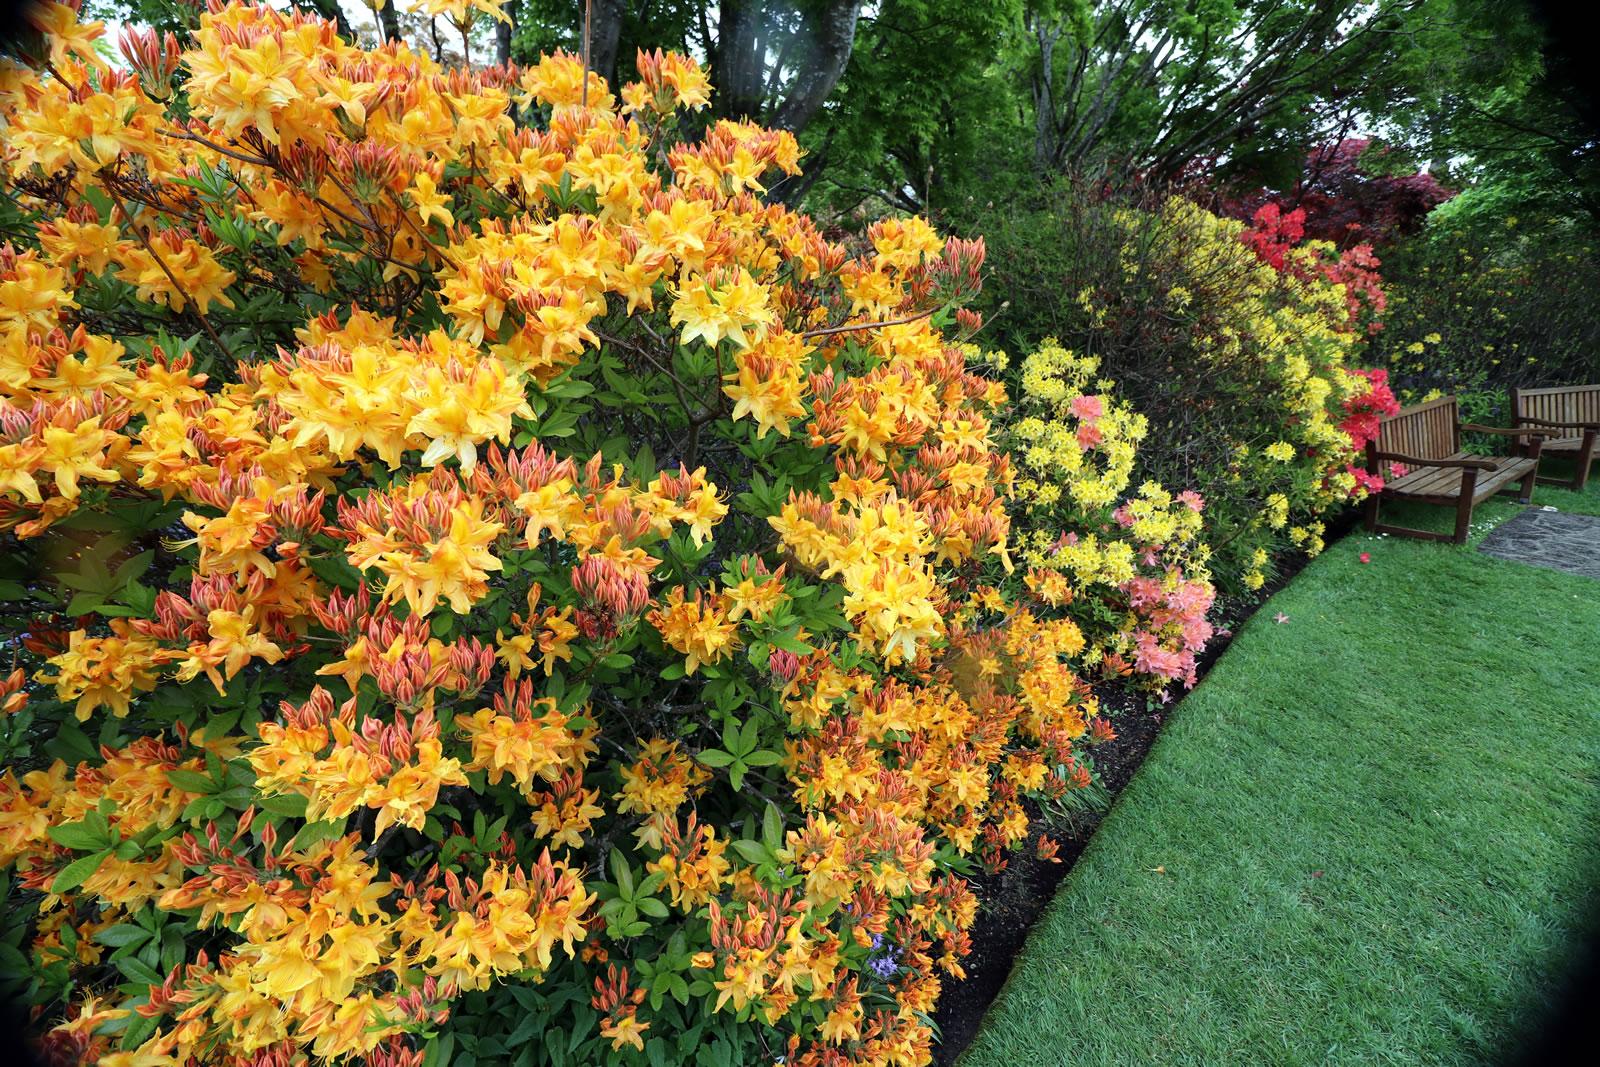 2017_10_15 Botanical Gardens 07